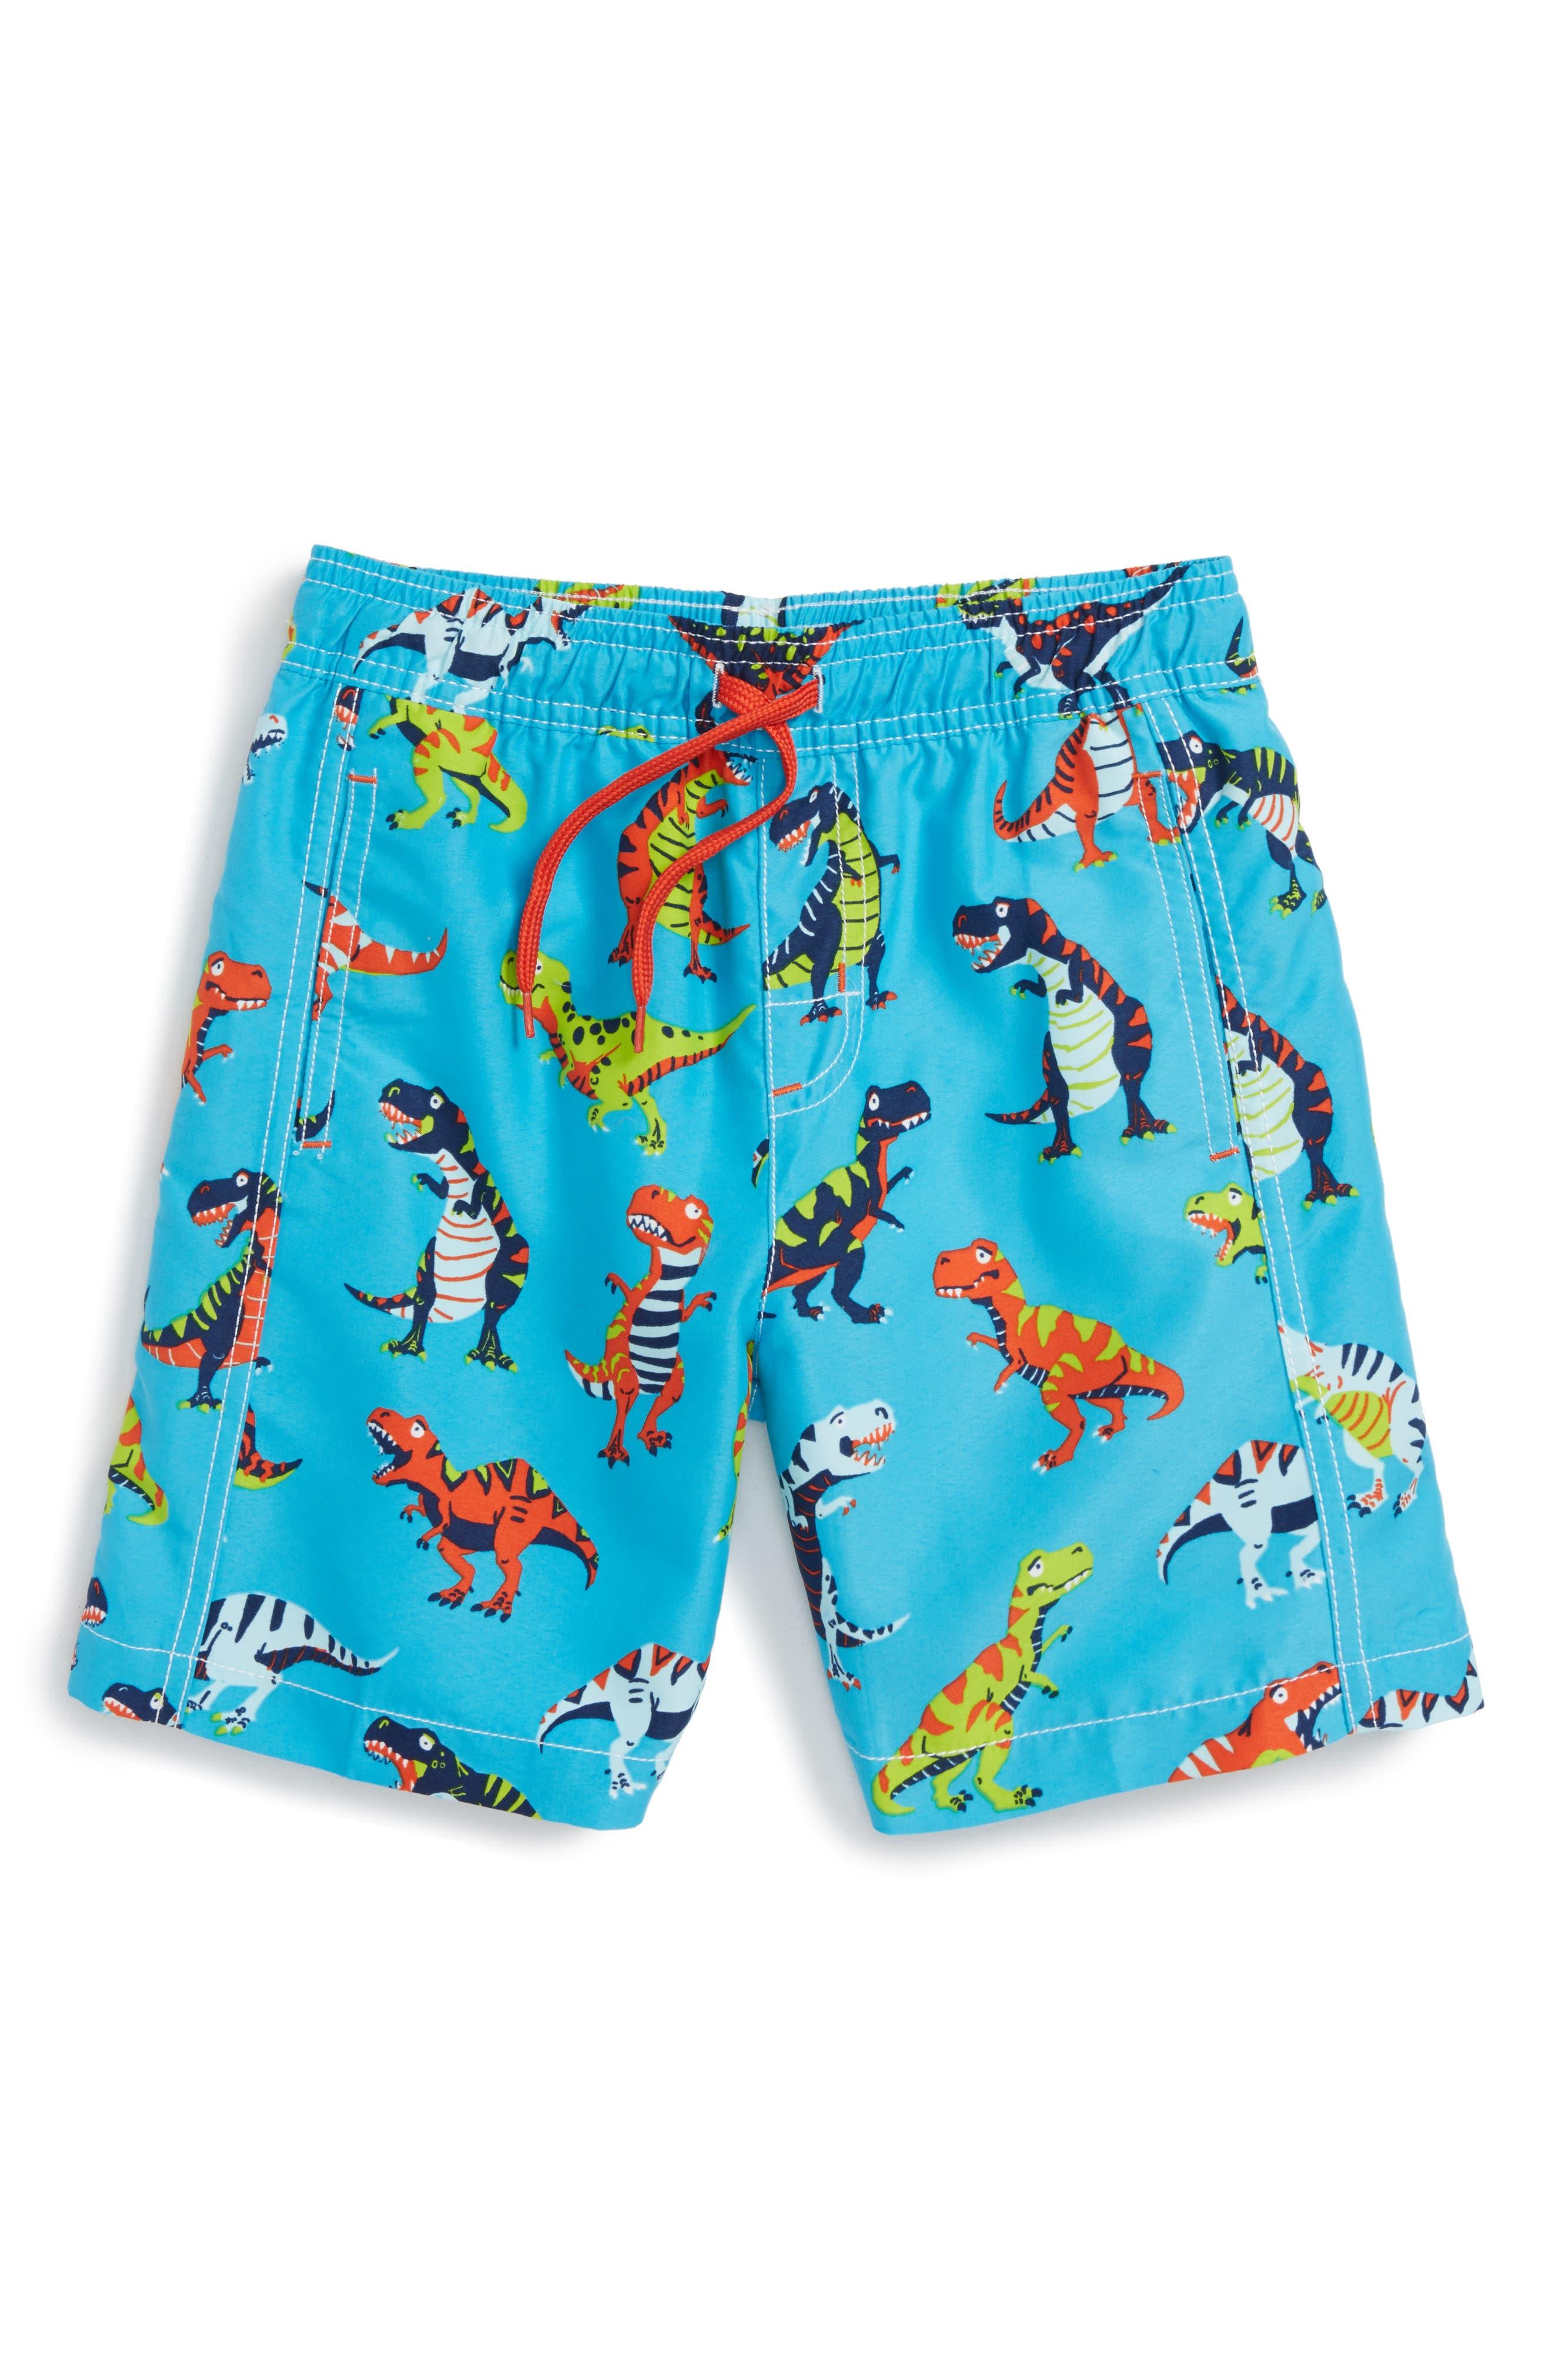 Roaring T-Rex Swim Trunks,                         Main,                         color, 400